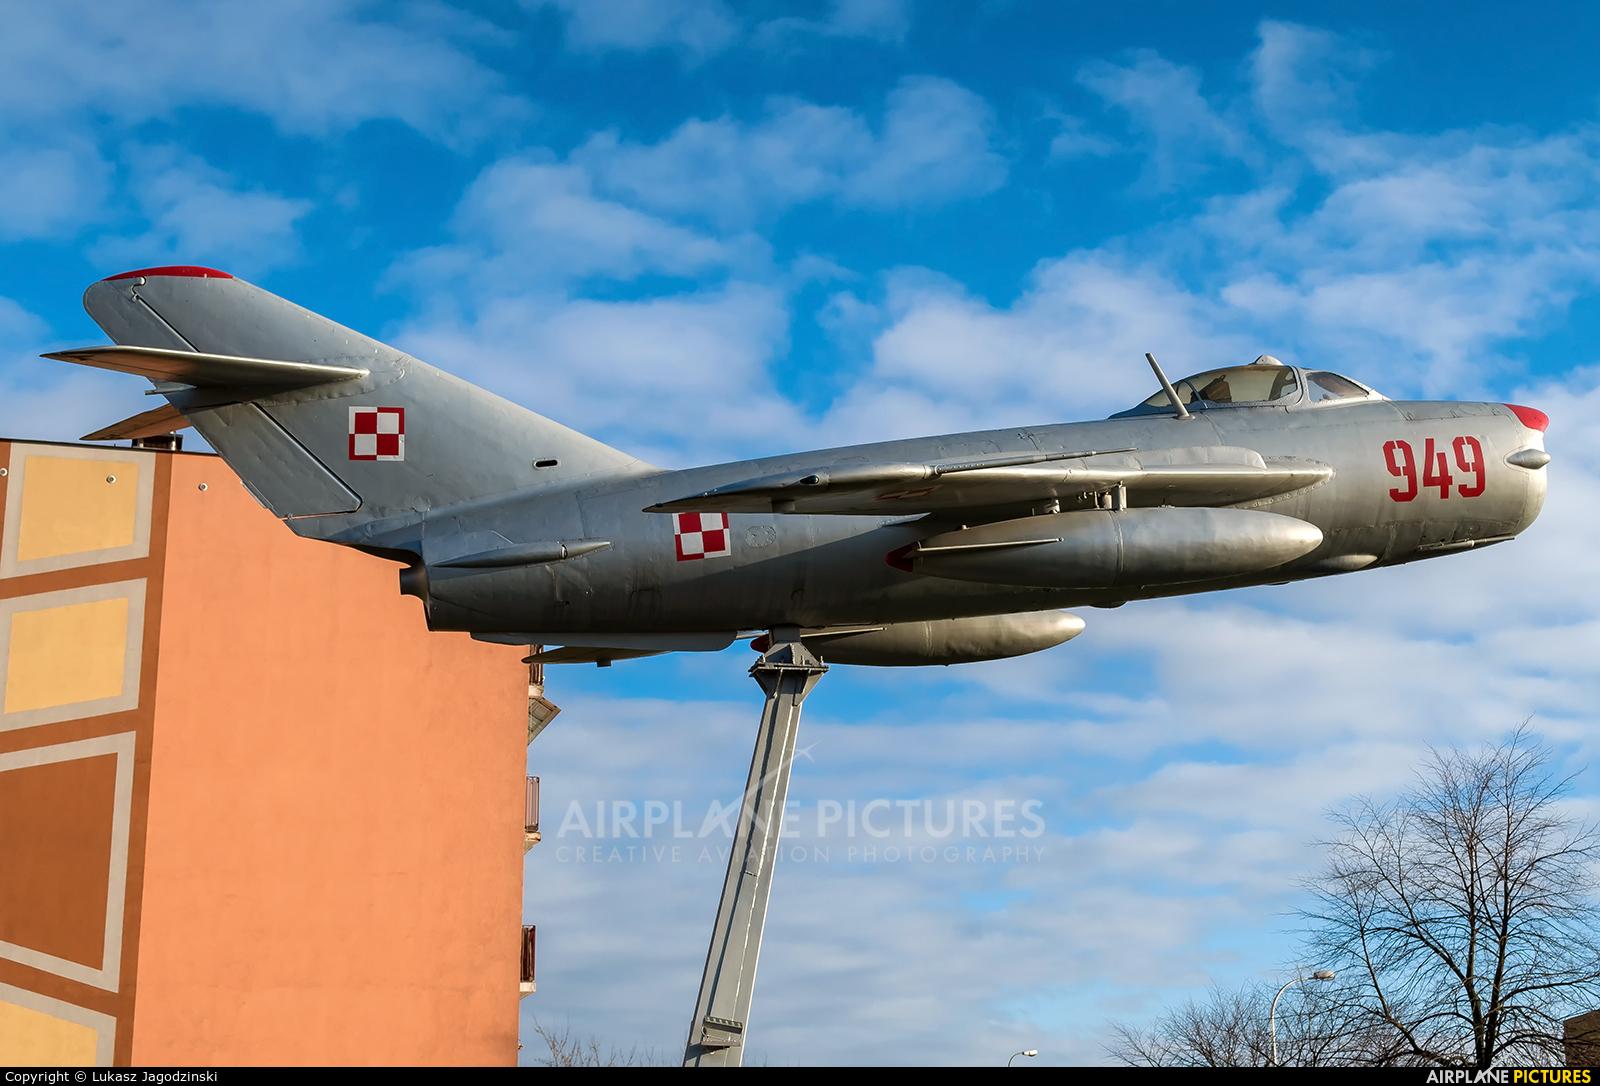 Poland - Air Force 949 aircraft at Off Airport - Poland